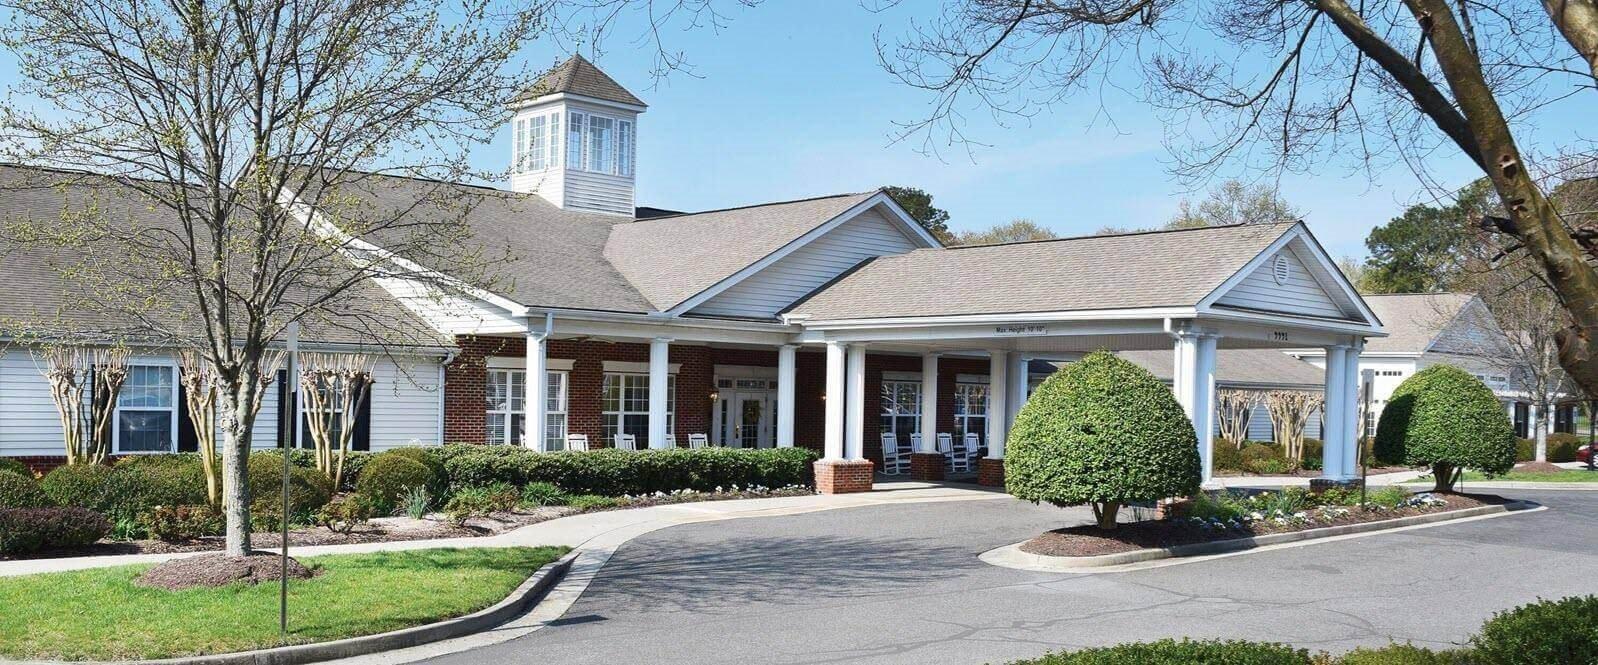 Elegant Exterior View Of Property at Spring Arbor of Richmond, Henrico, VA, 23233